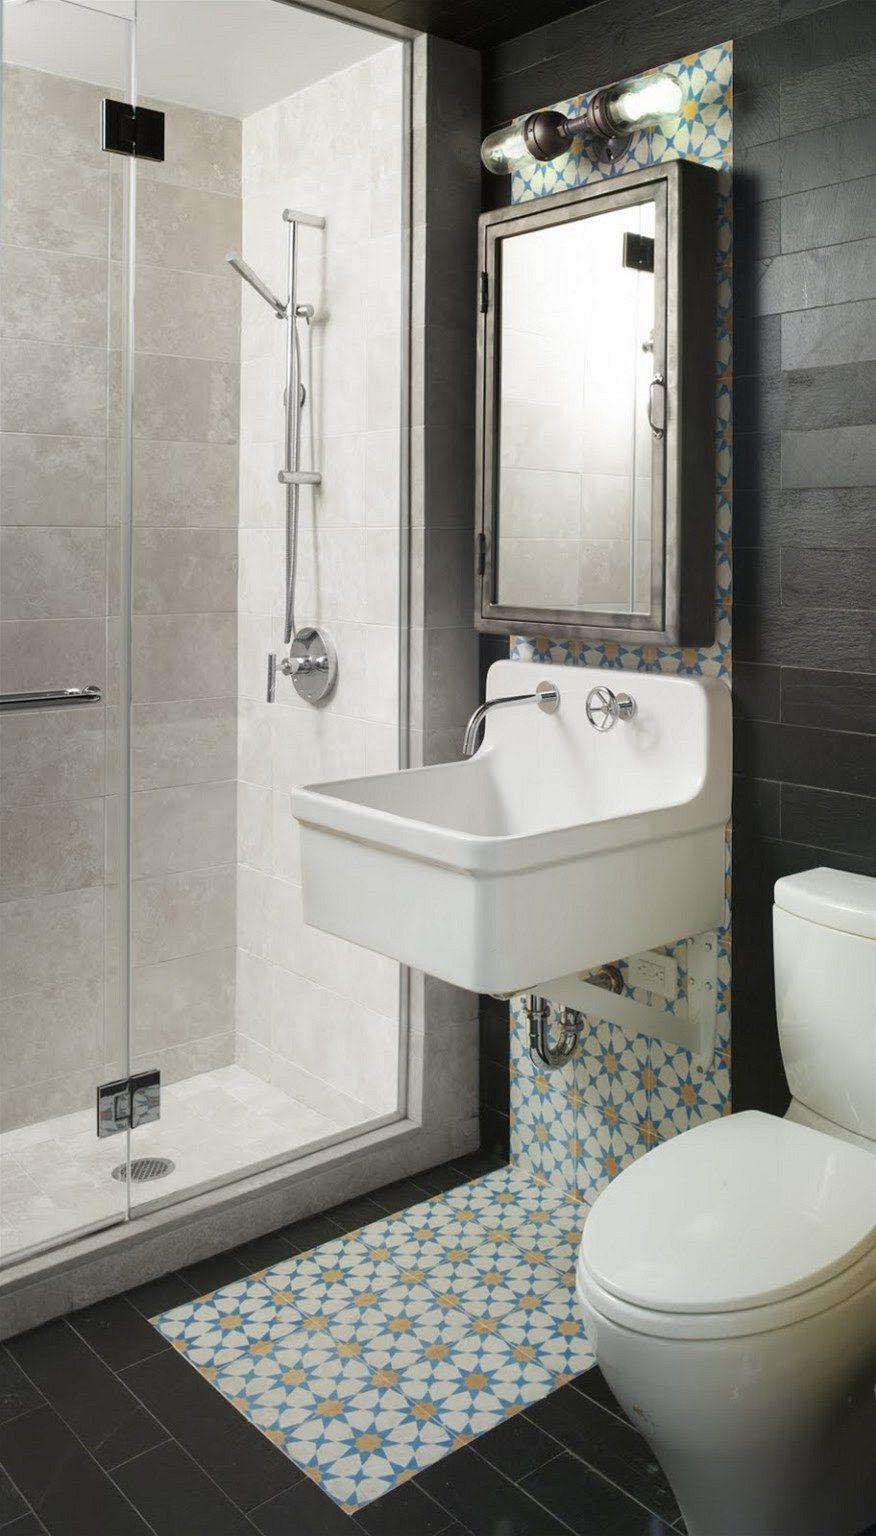 Badideen für kleine räume mexické dlaždičky zdobí i koupelnu pro hosty  small bathrooms